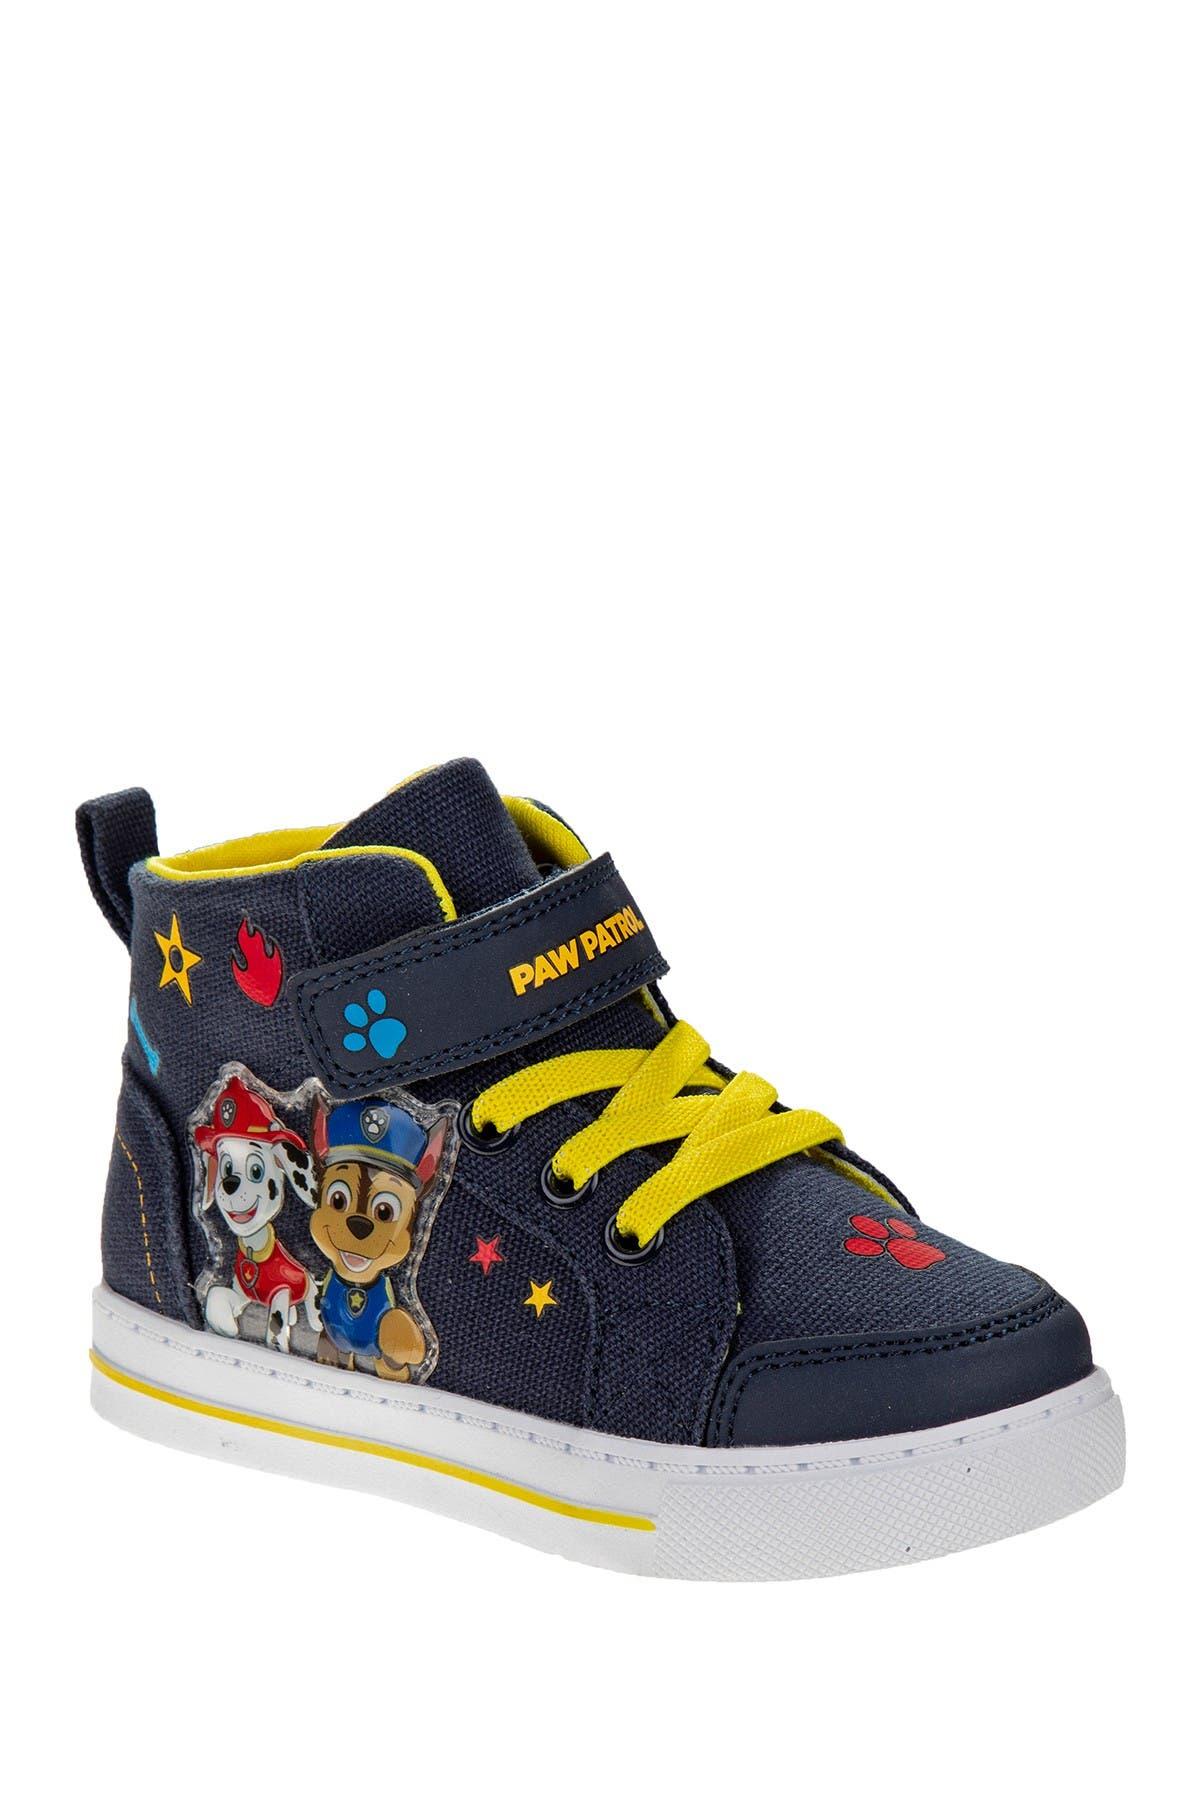 Josmo | Paw Patrol High Top Sneaker